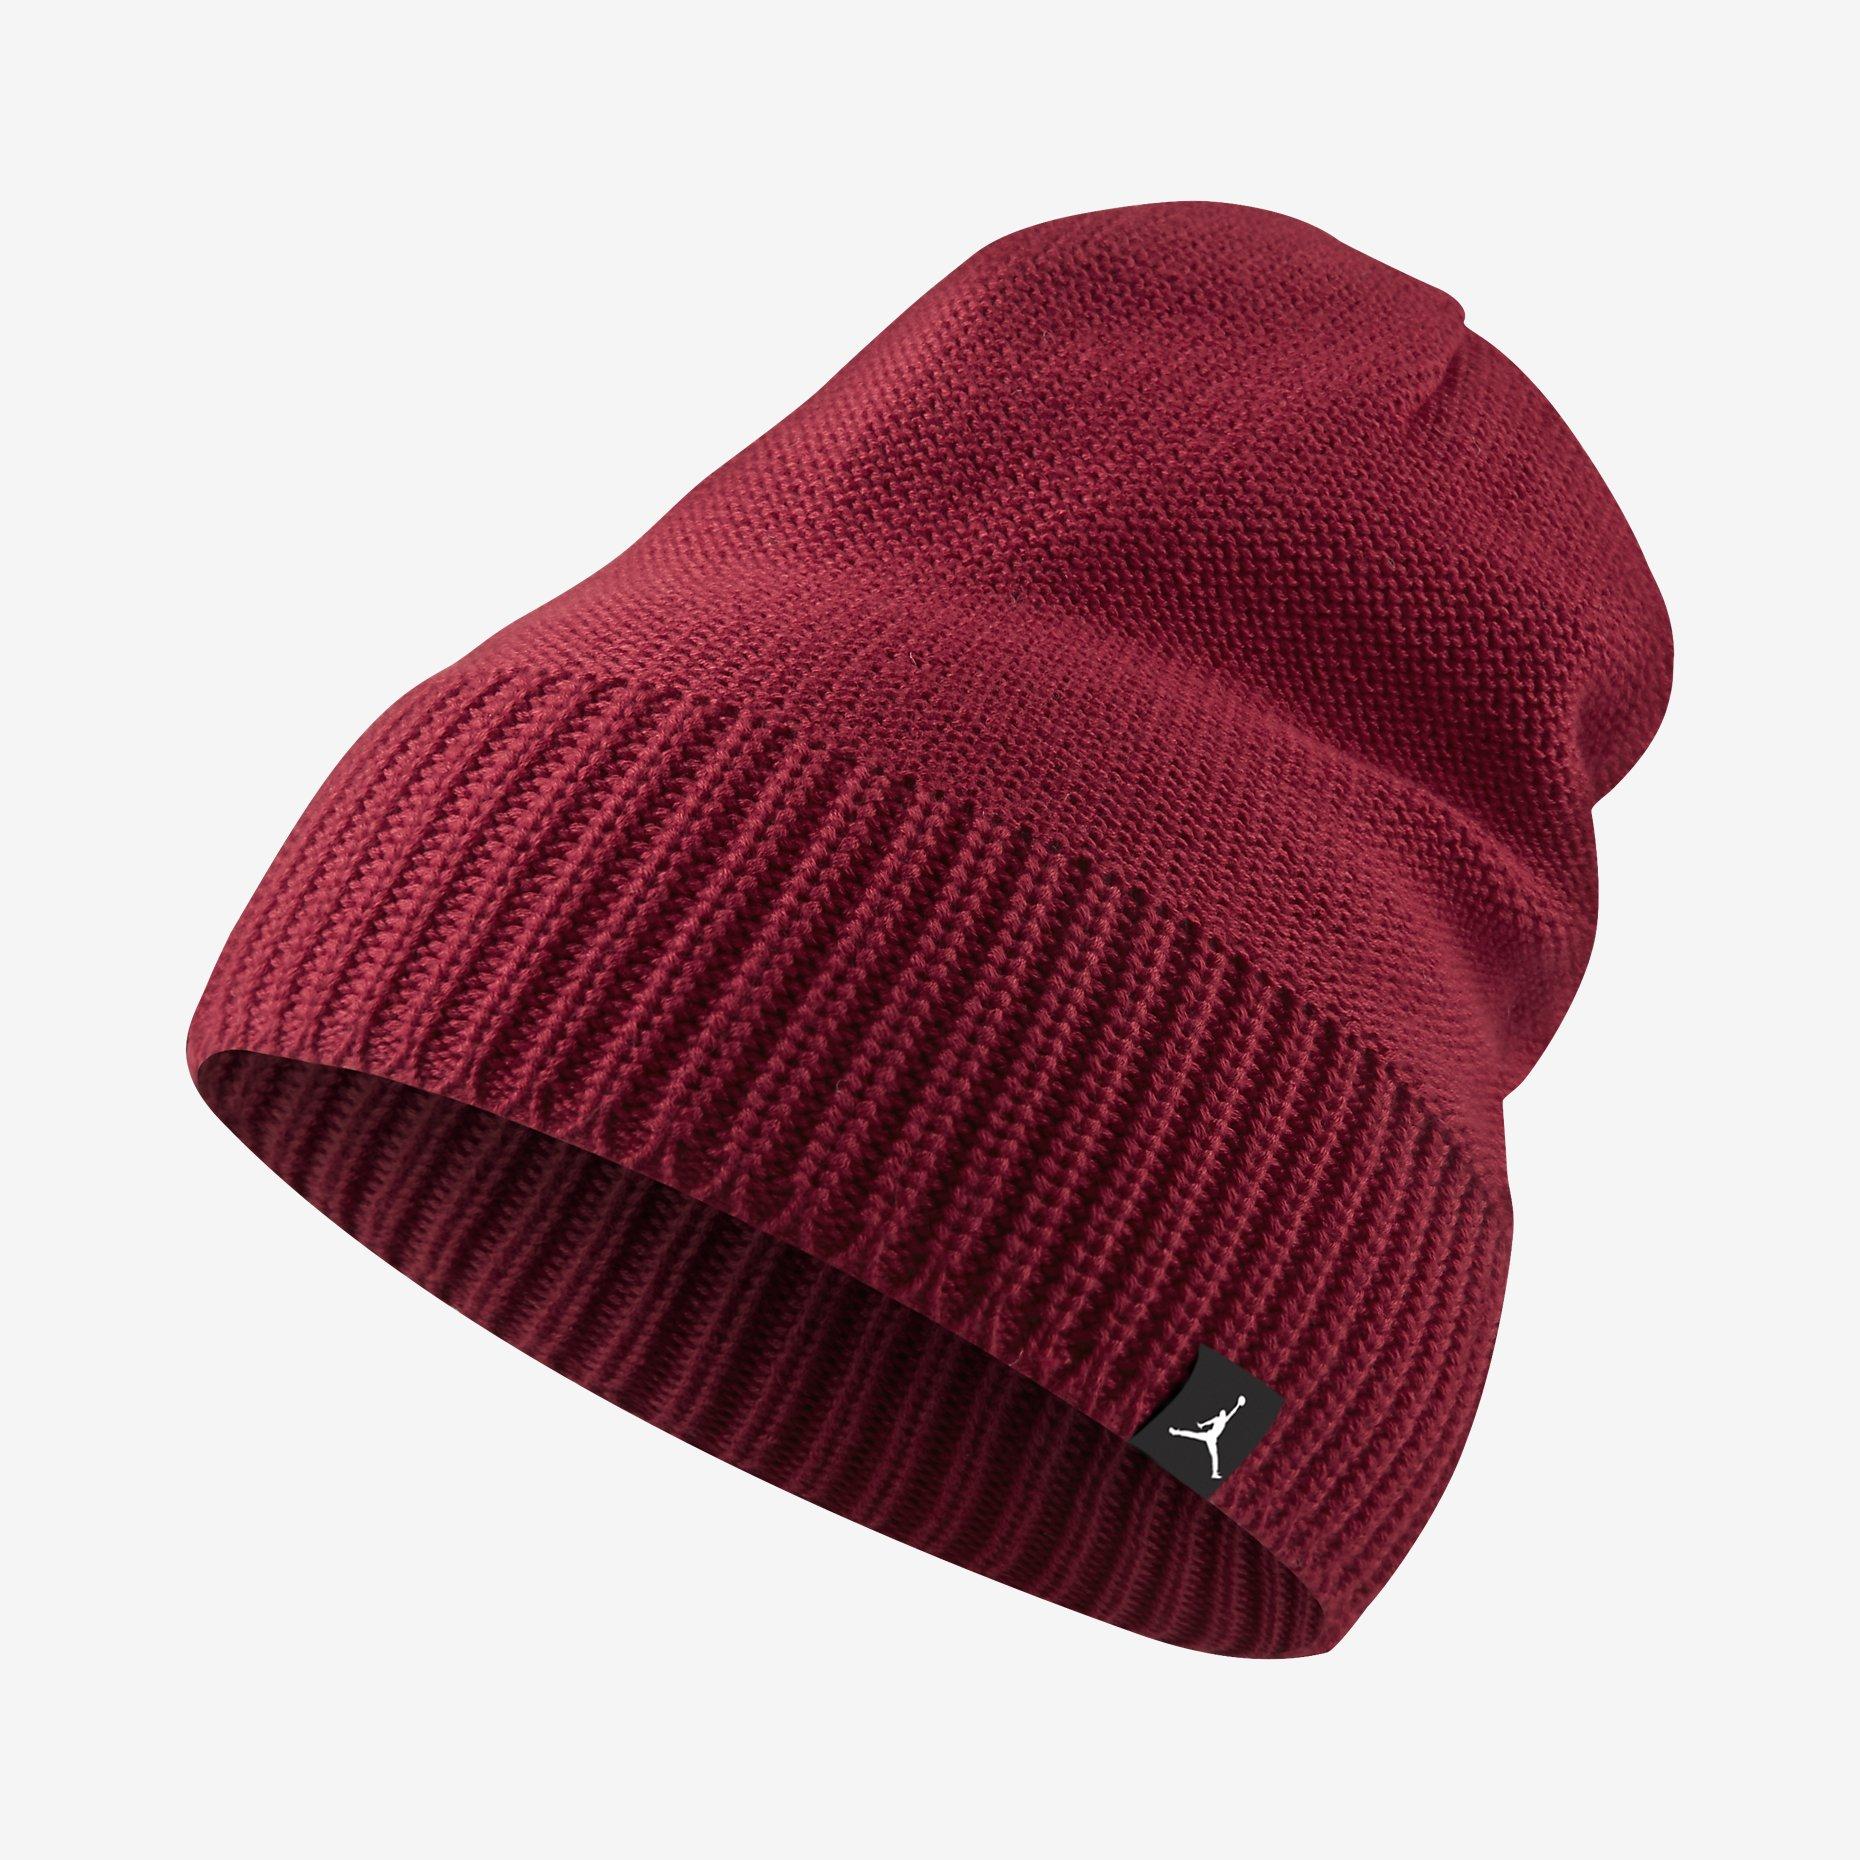 3b054221f42d22 Jordan Jumpman Beanie Knit Hat (rojo) - manelsanchez.com